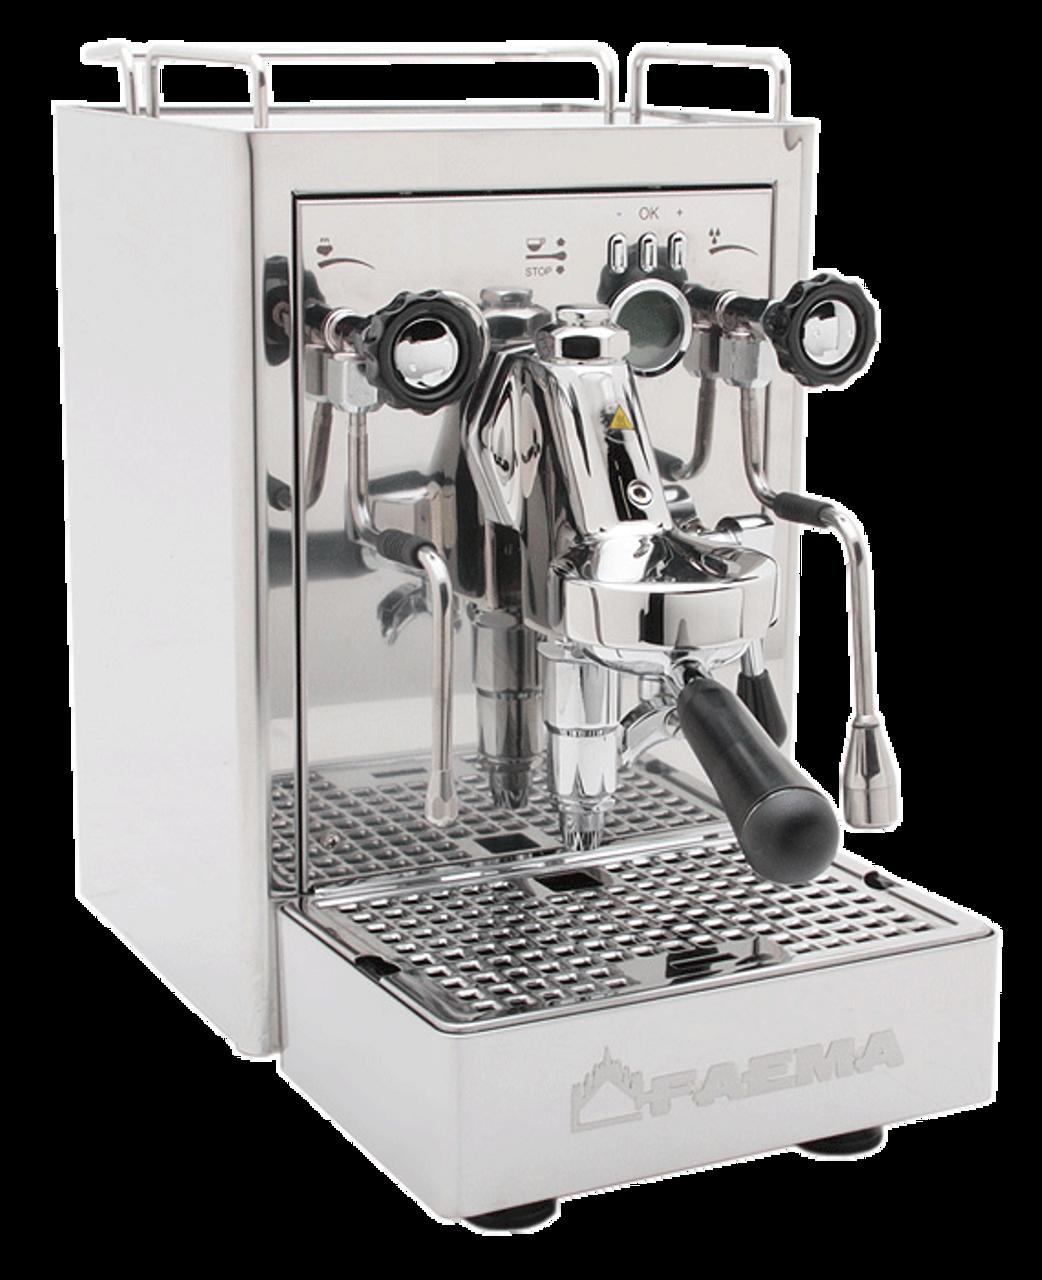 Faema Carisma S1 Price Amp Reviews Espresso Coffee Machine